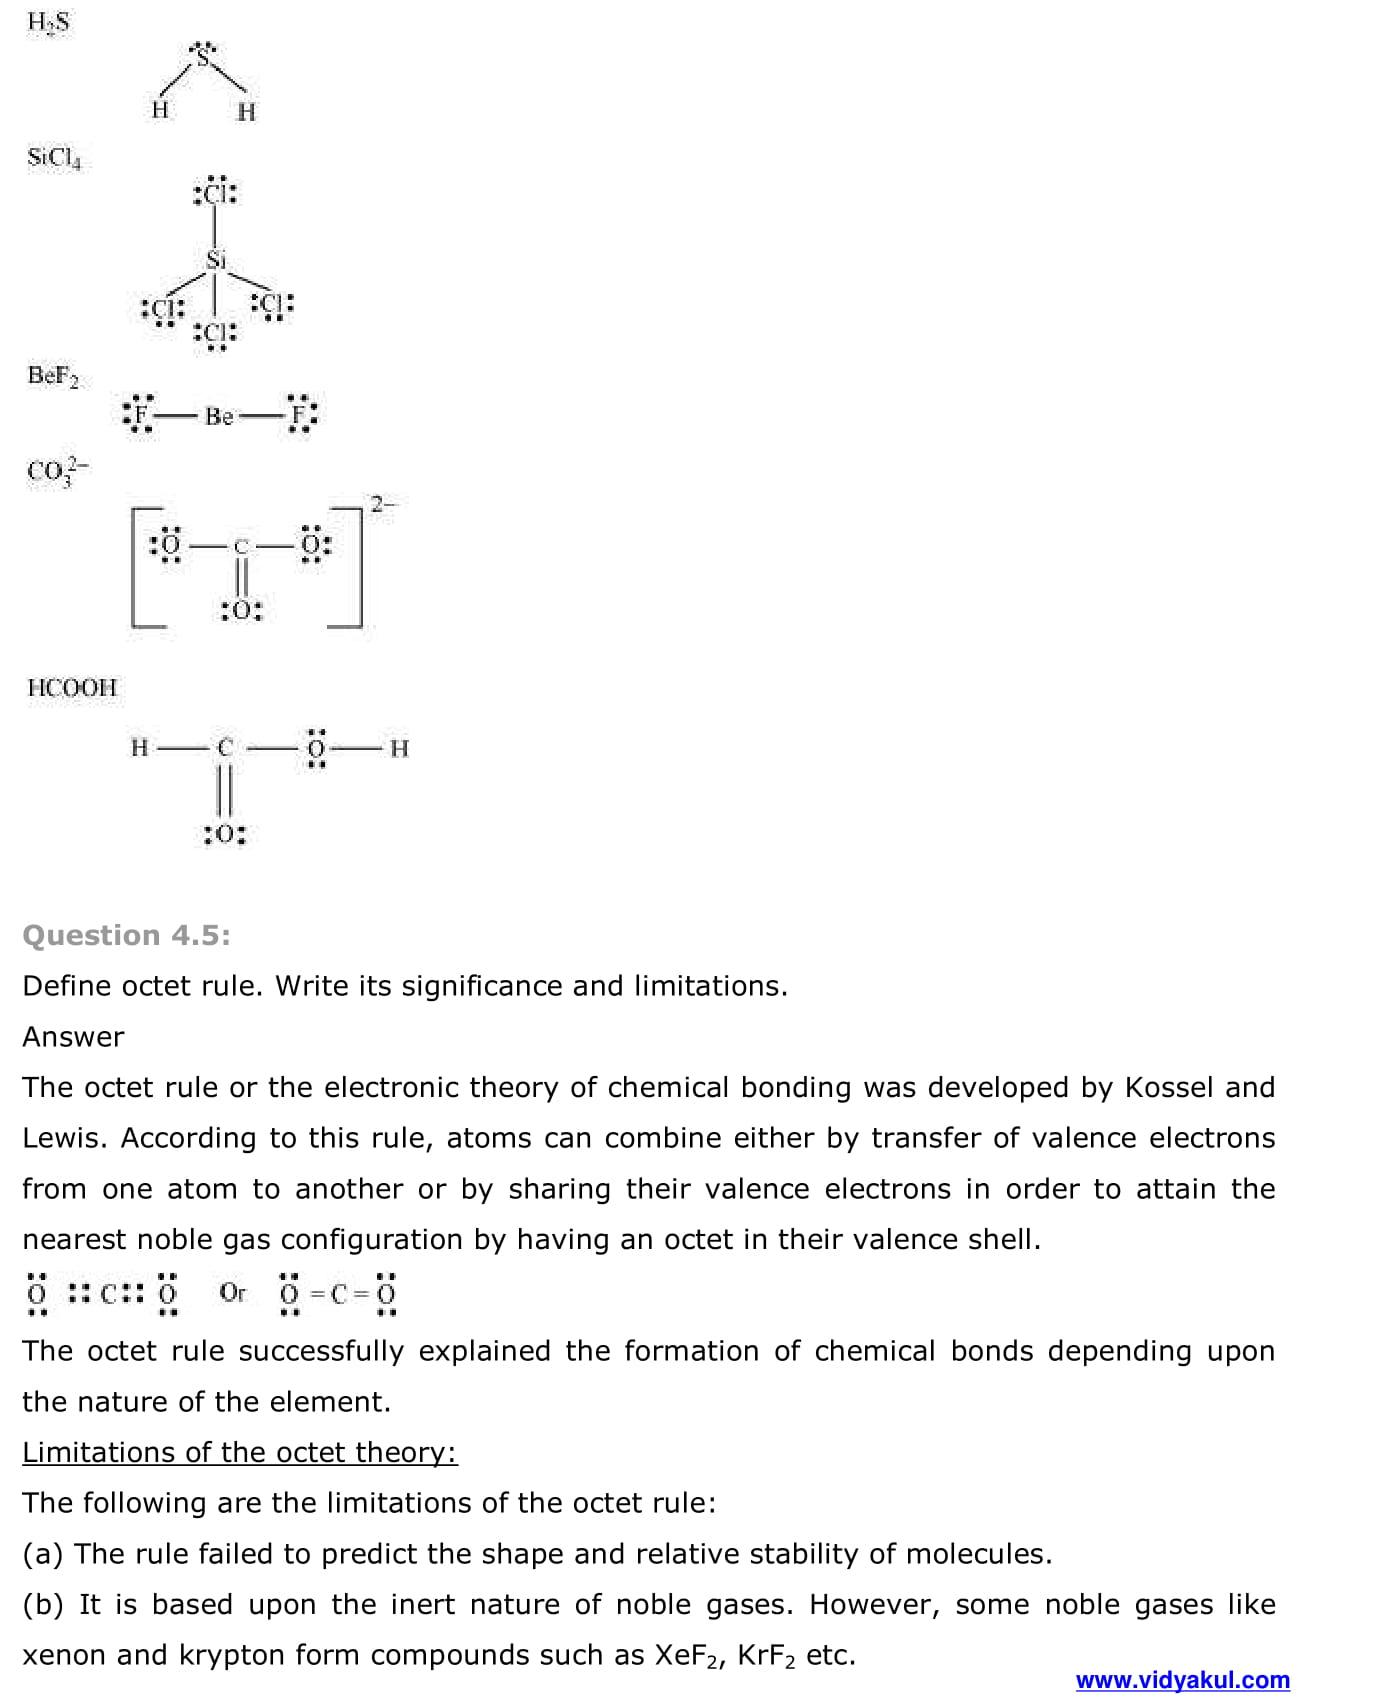 NCERT Solutions Class 11 Chemistry Chapter 4 | Vidyakul